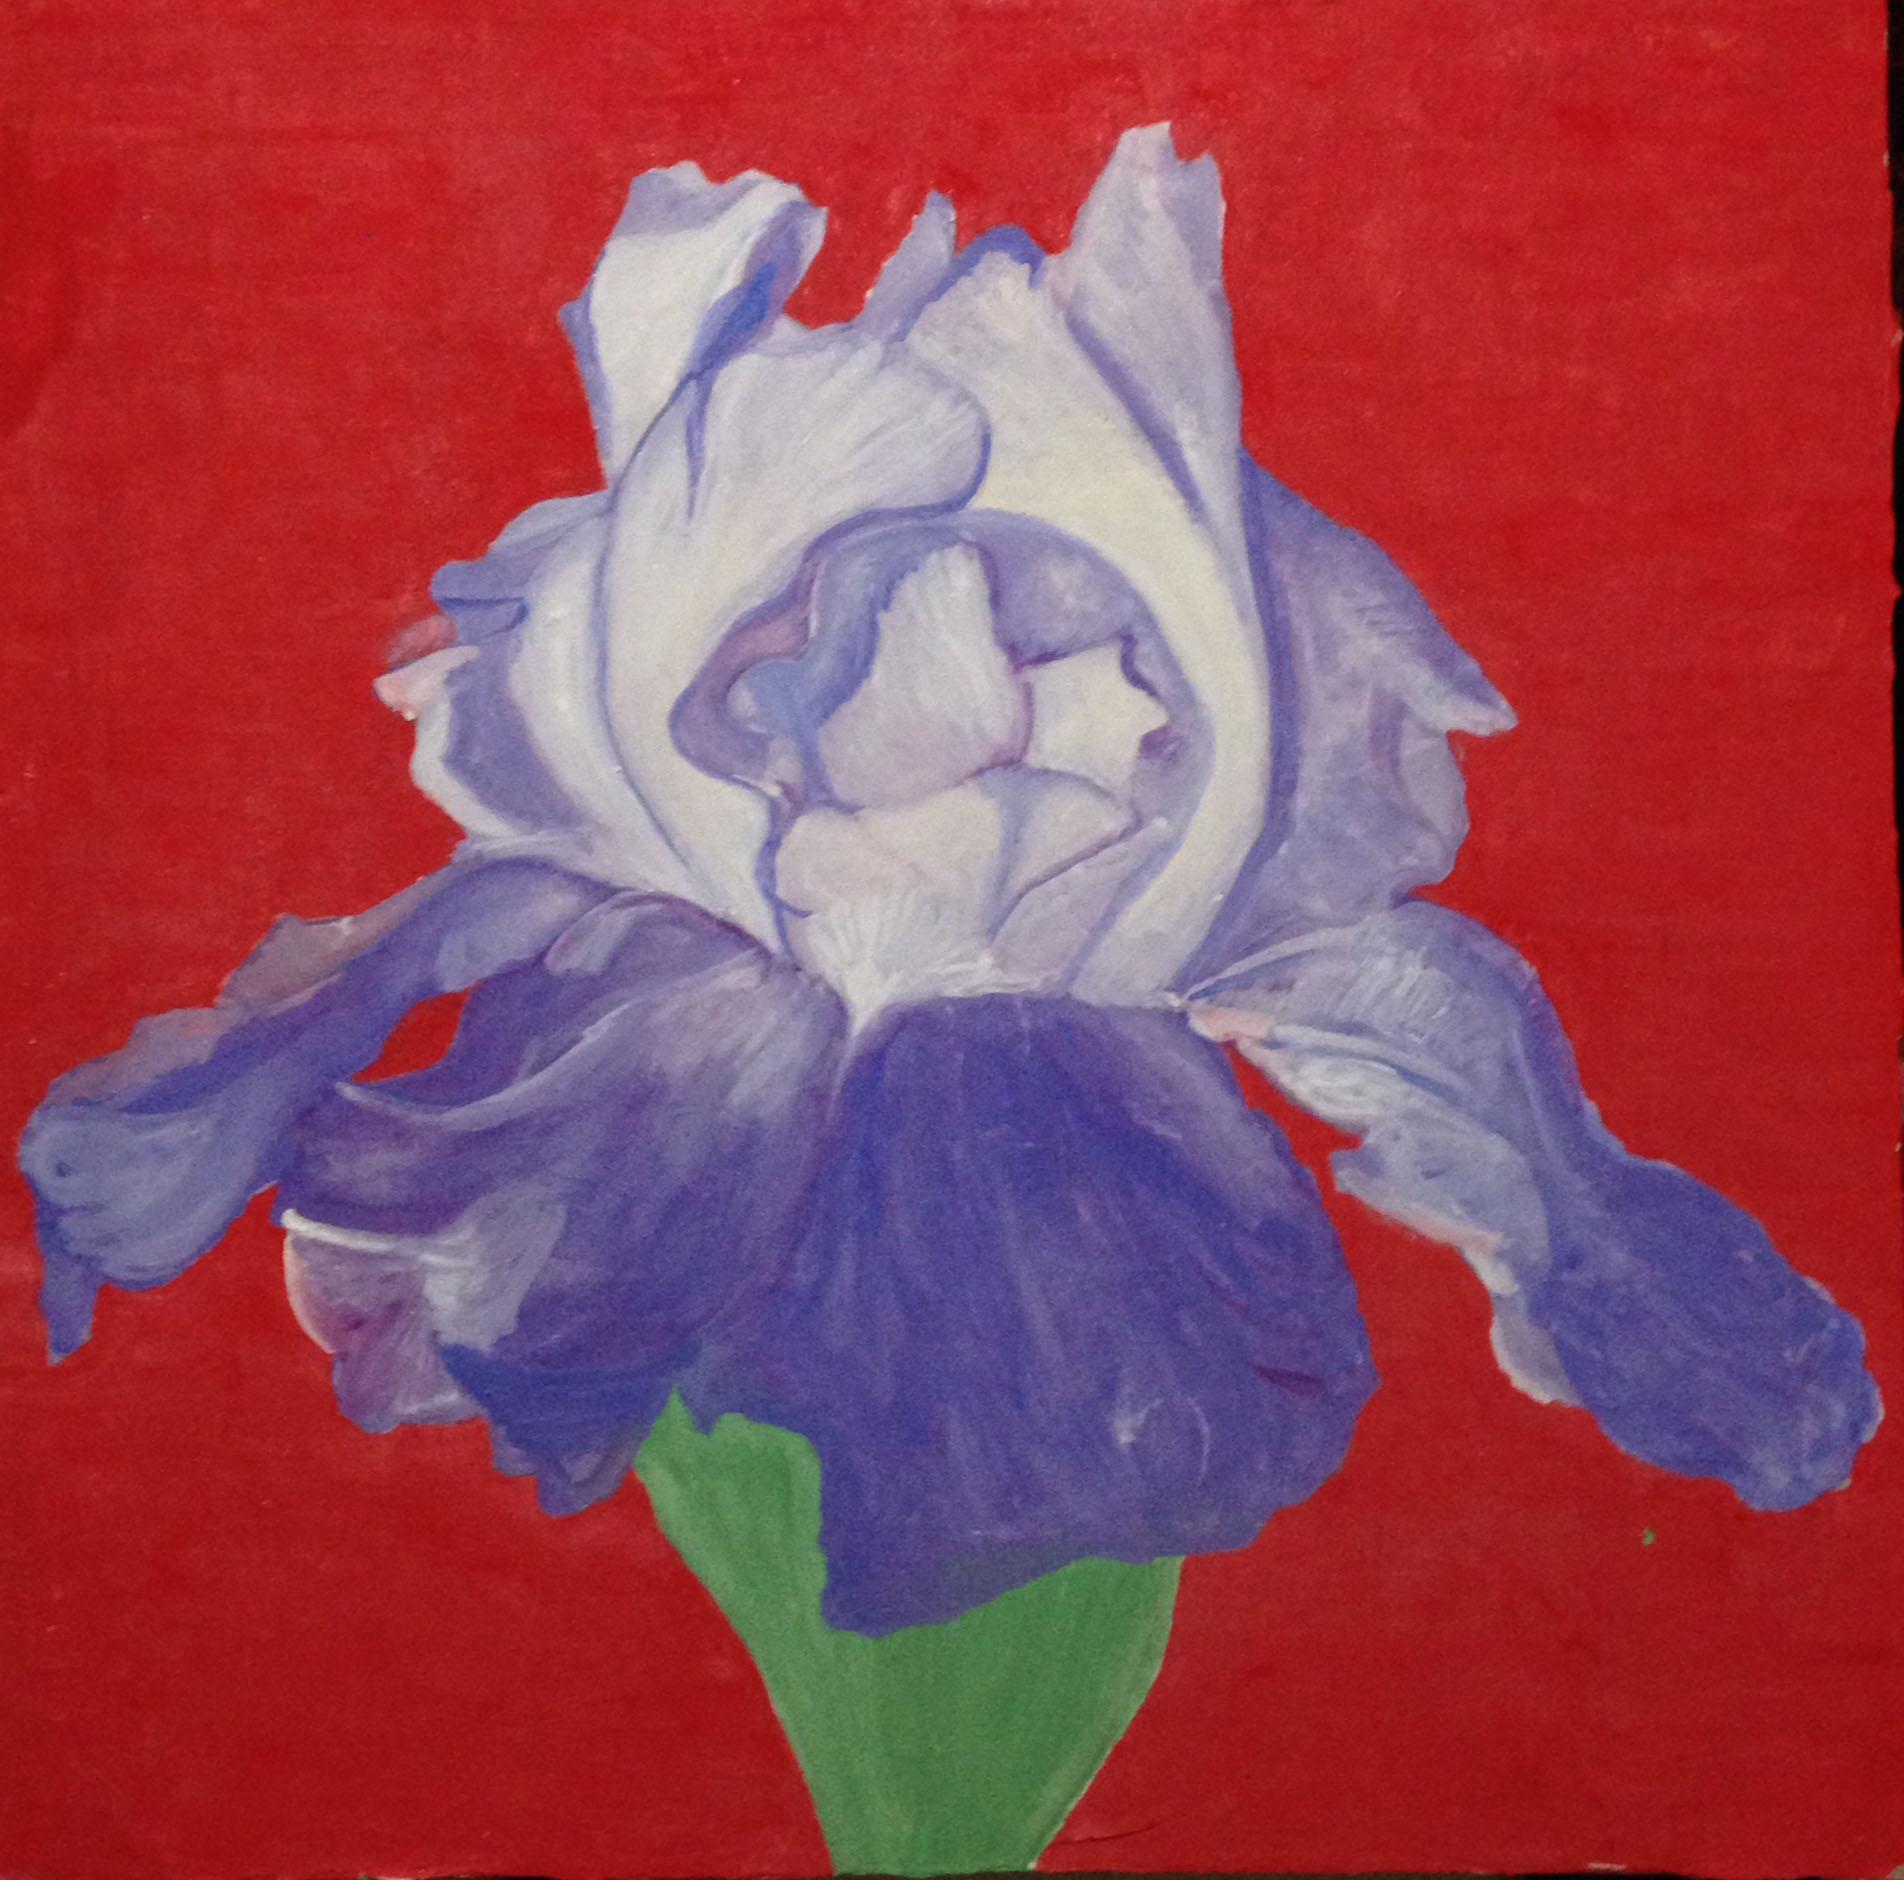 "Mark Turgeon  Iris,  2008 Fresco on plaster on wood 24"" x 24"" Retail Value: $2500 Opening Bid: $1200"